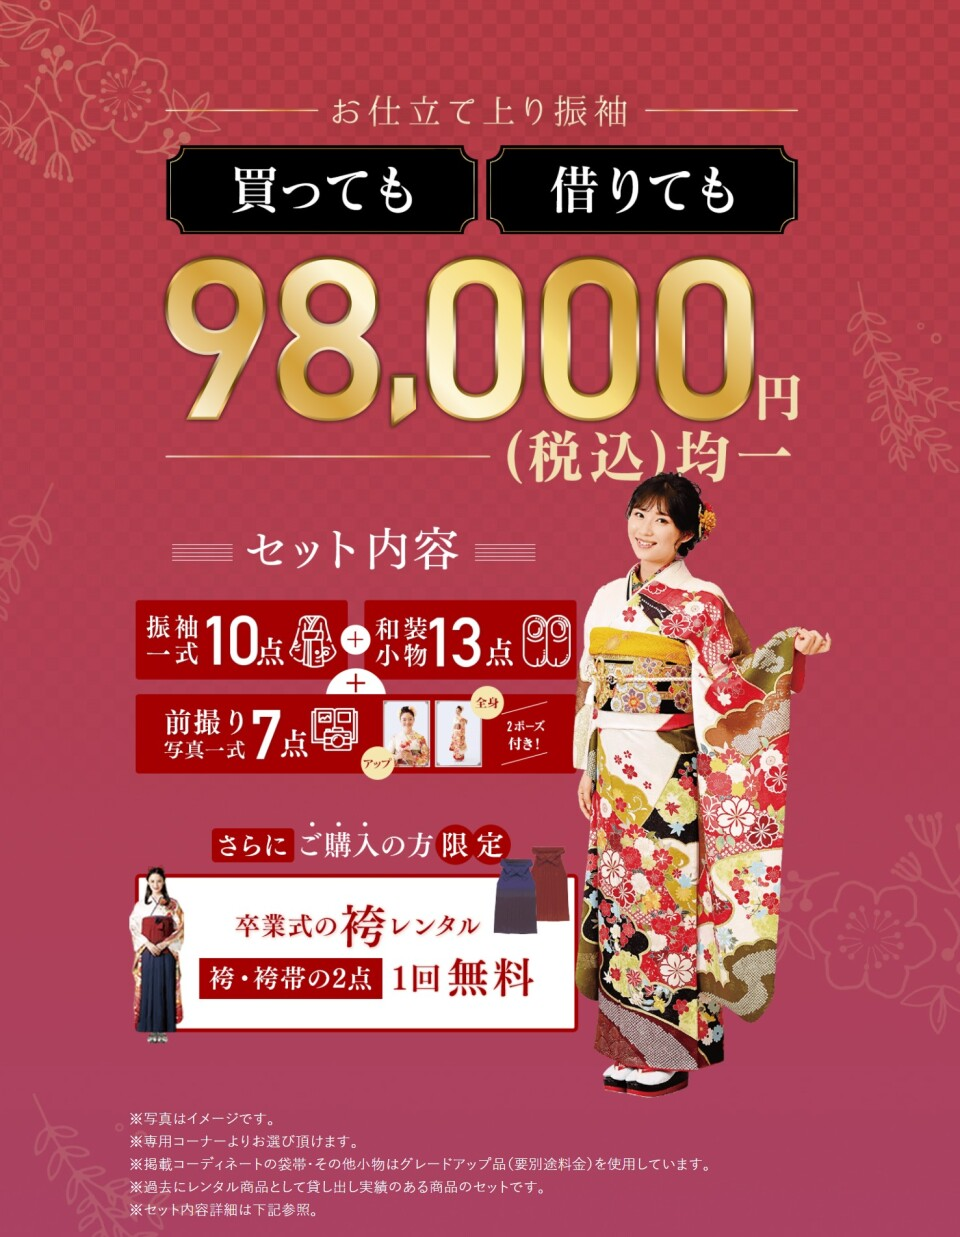 FireShot Capture 6414 - 振袖グランマルシェ|成人式の振袖レンタル・販売オンディーヌ - www.ondine.jp